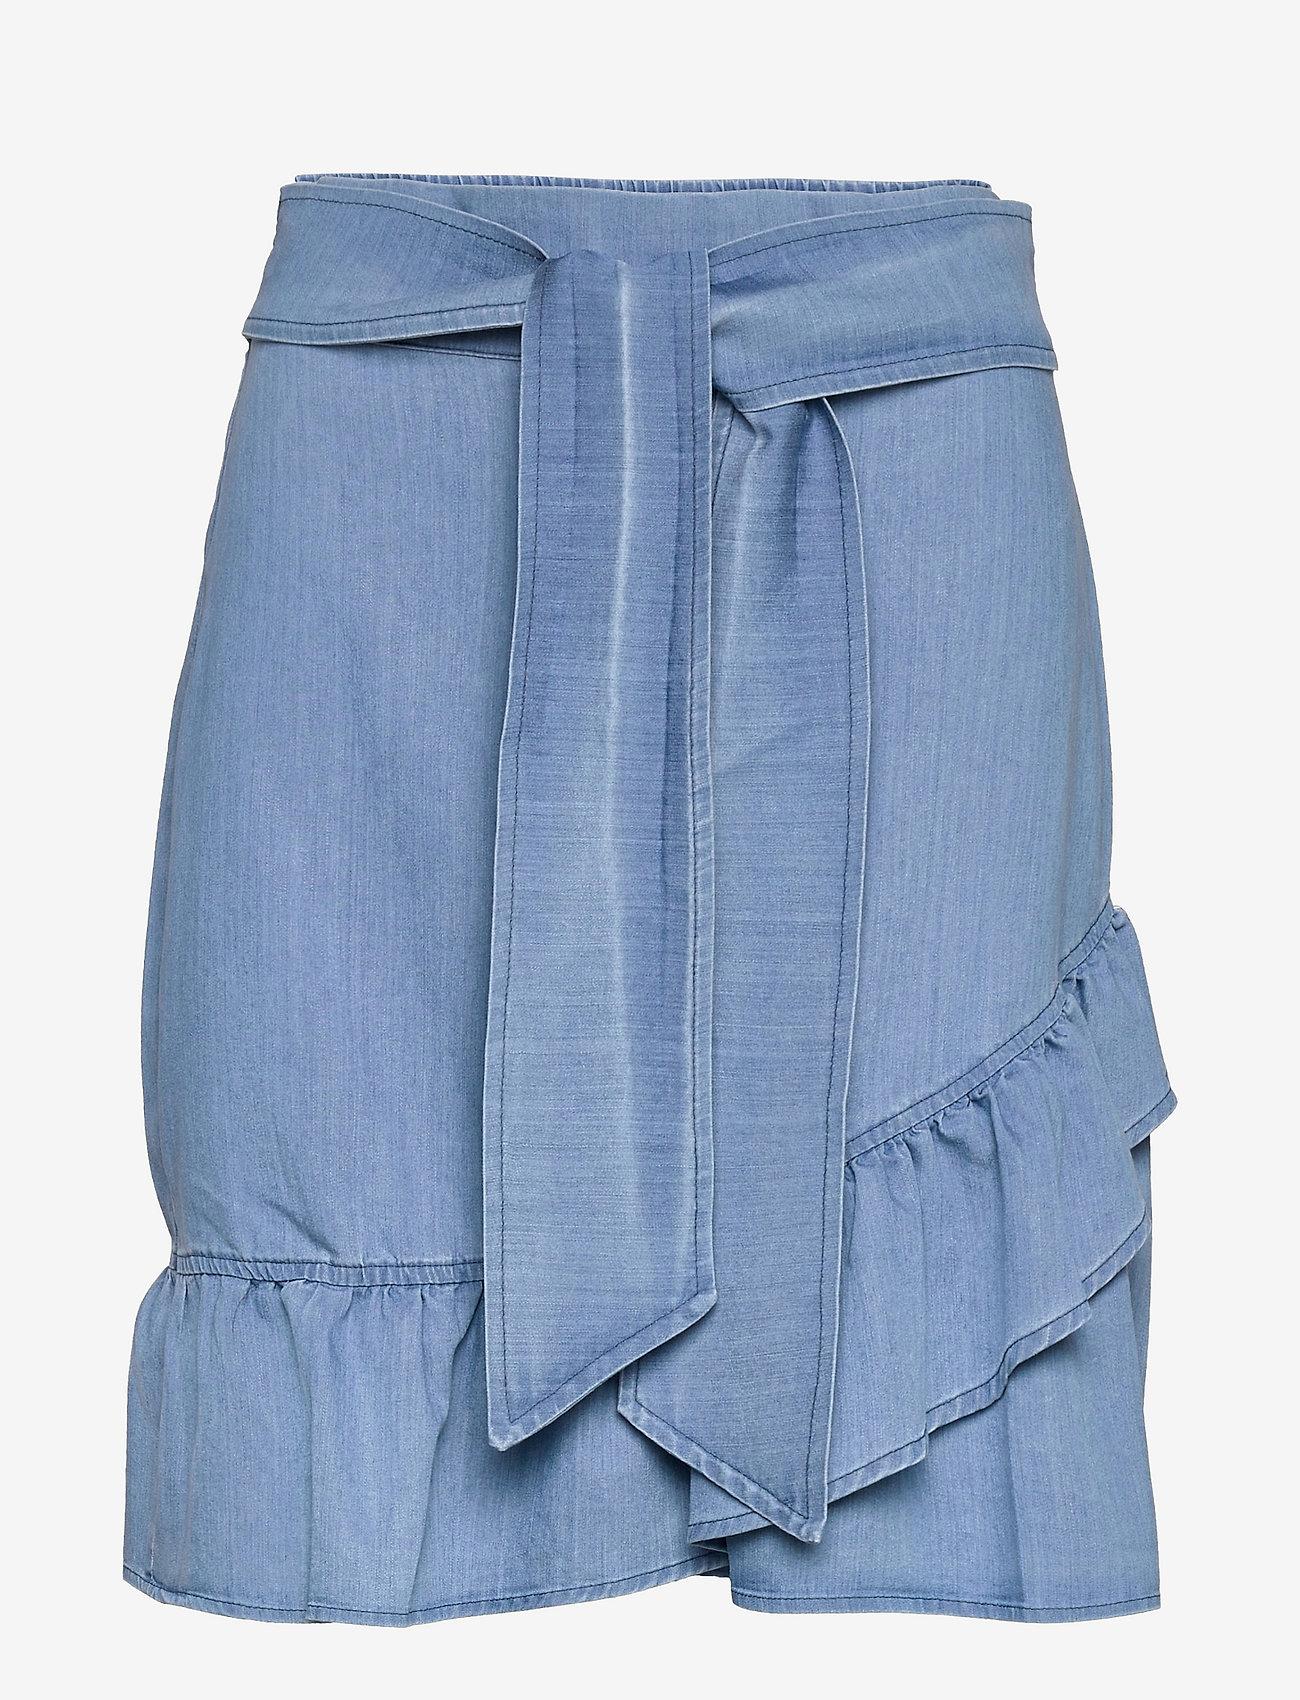 ella&il - Jus denim skirt - jupes en jeans - blue denim - 0